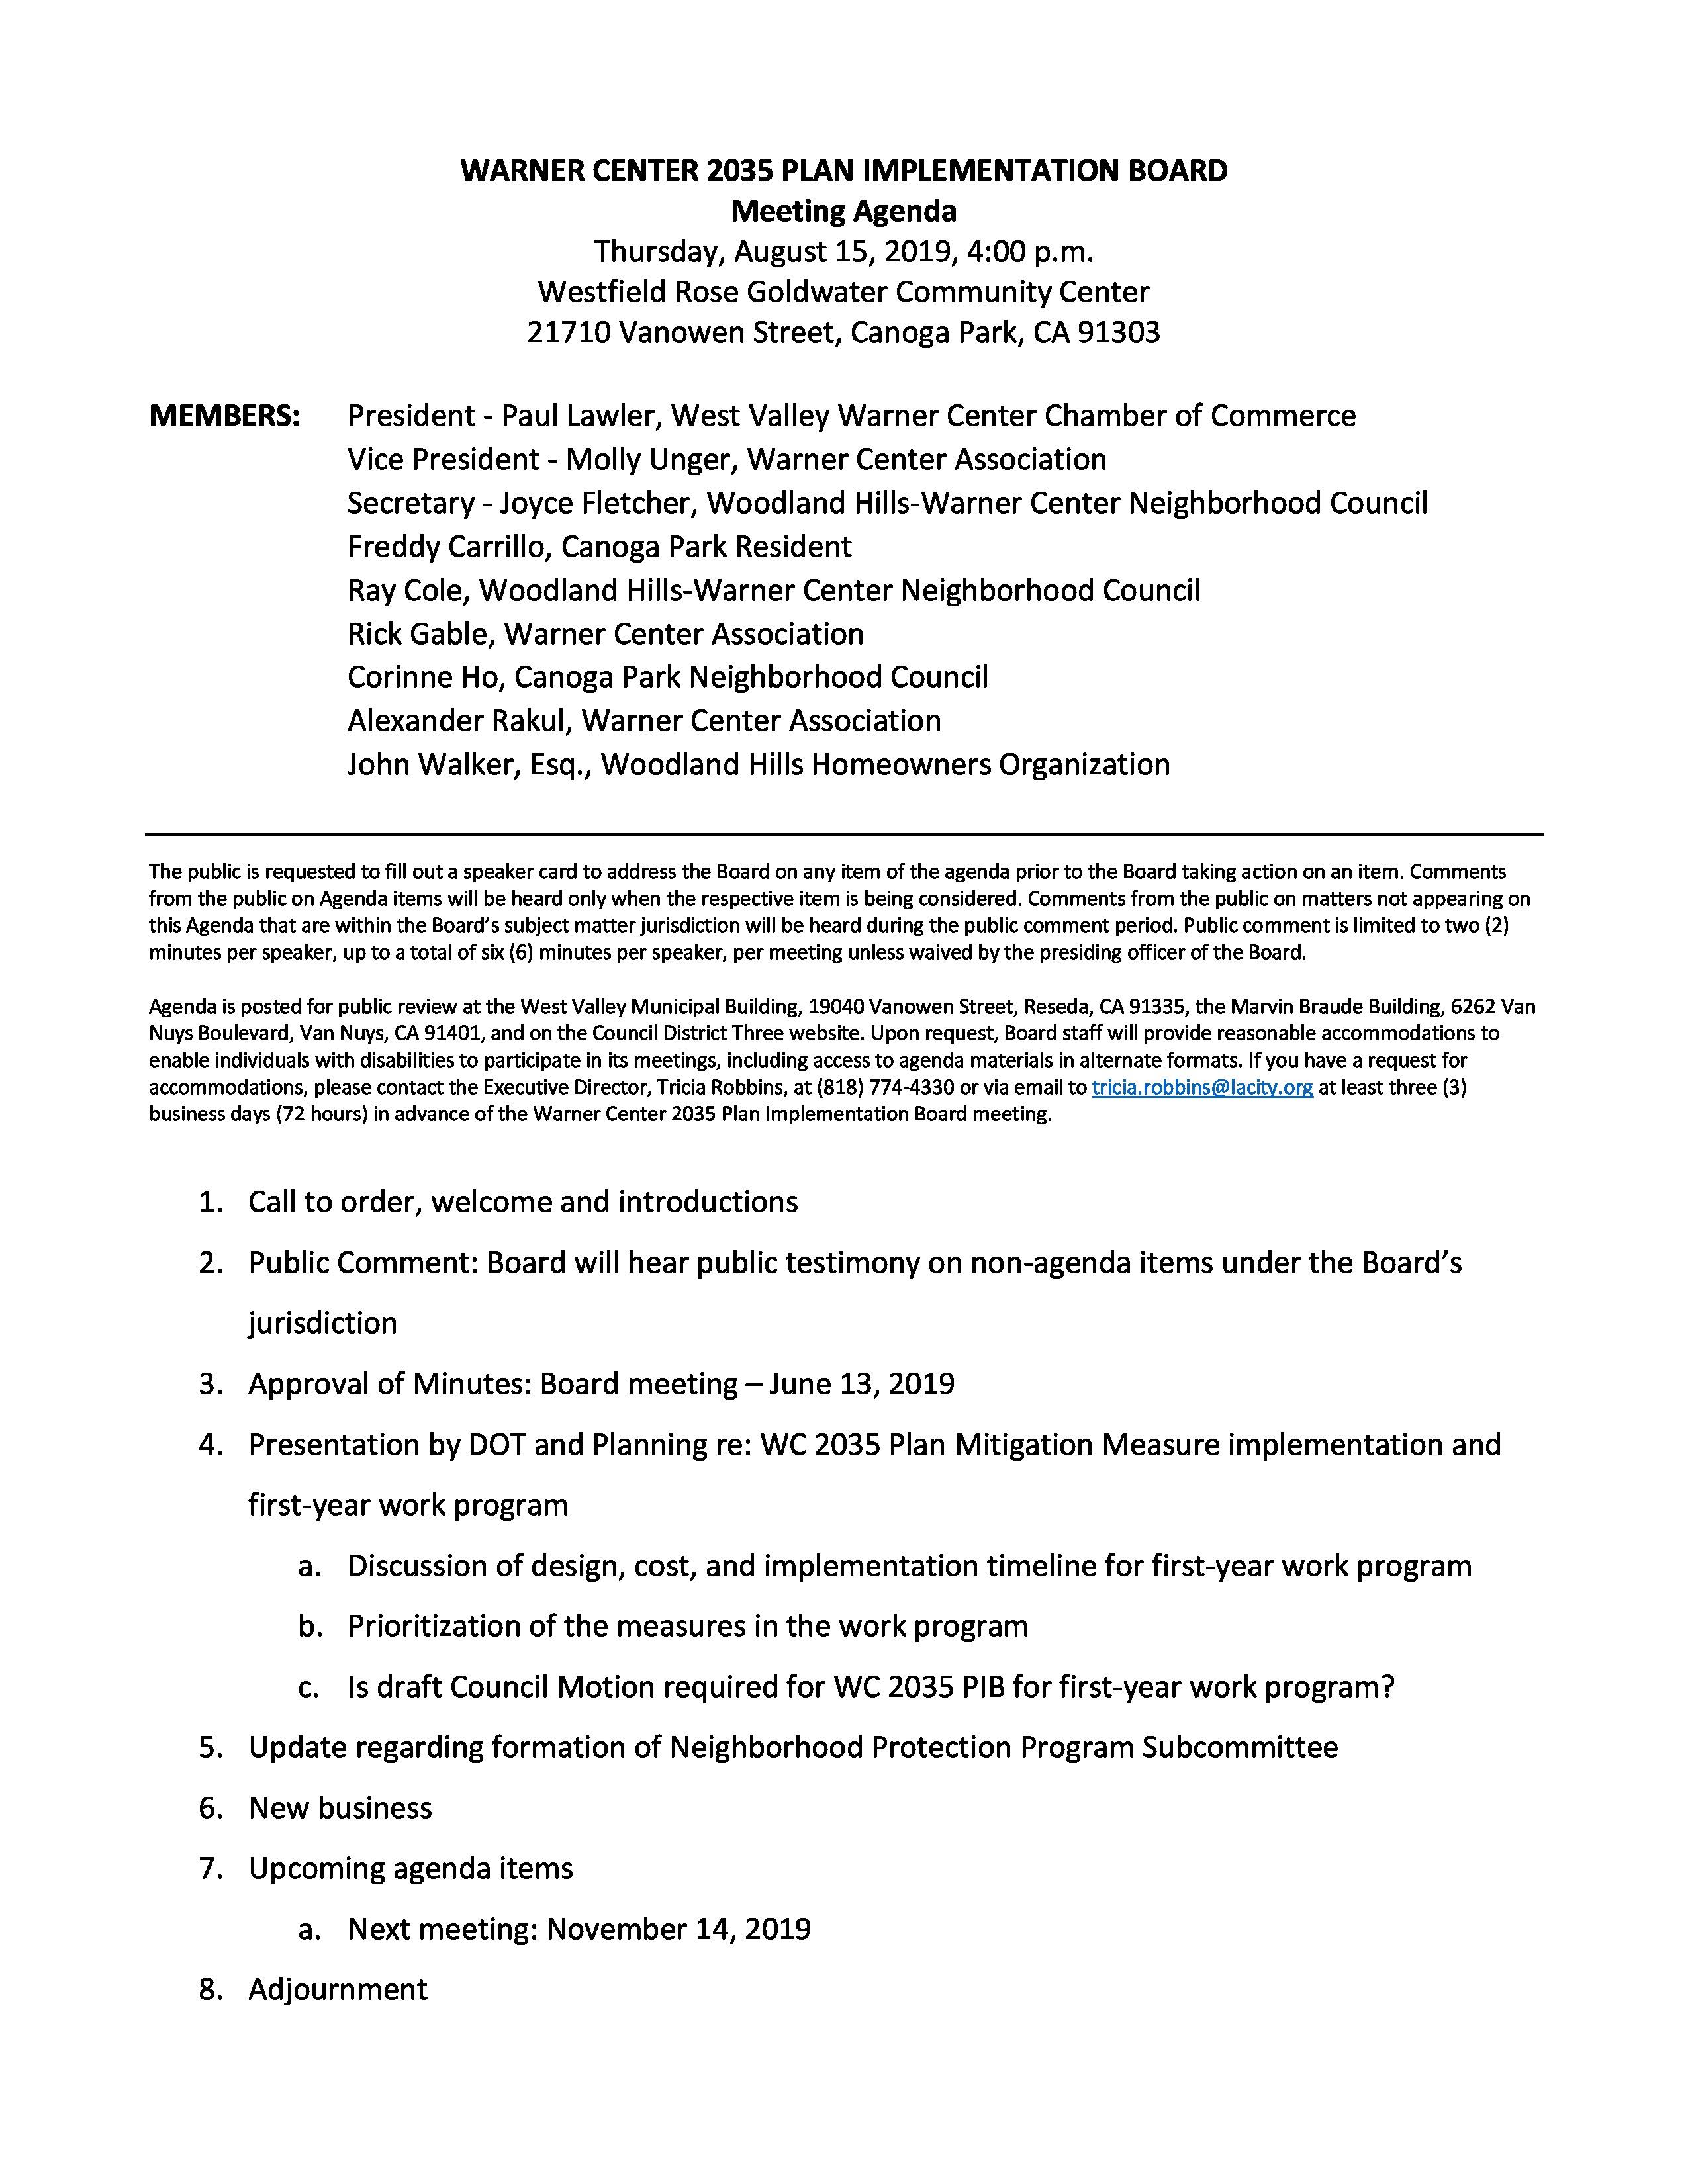 8.15.19_Mtg_Agenda_WC_2035_PLAN_IMPLEMENTATION_BOARD-page-0.jpg